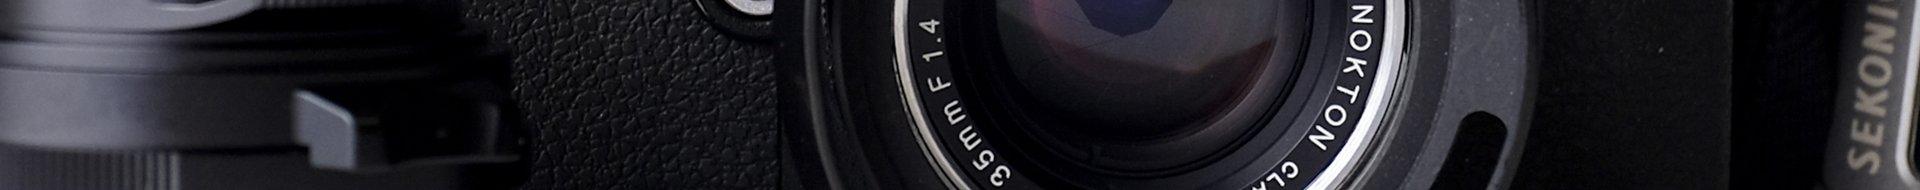 30/35mm